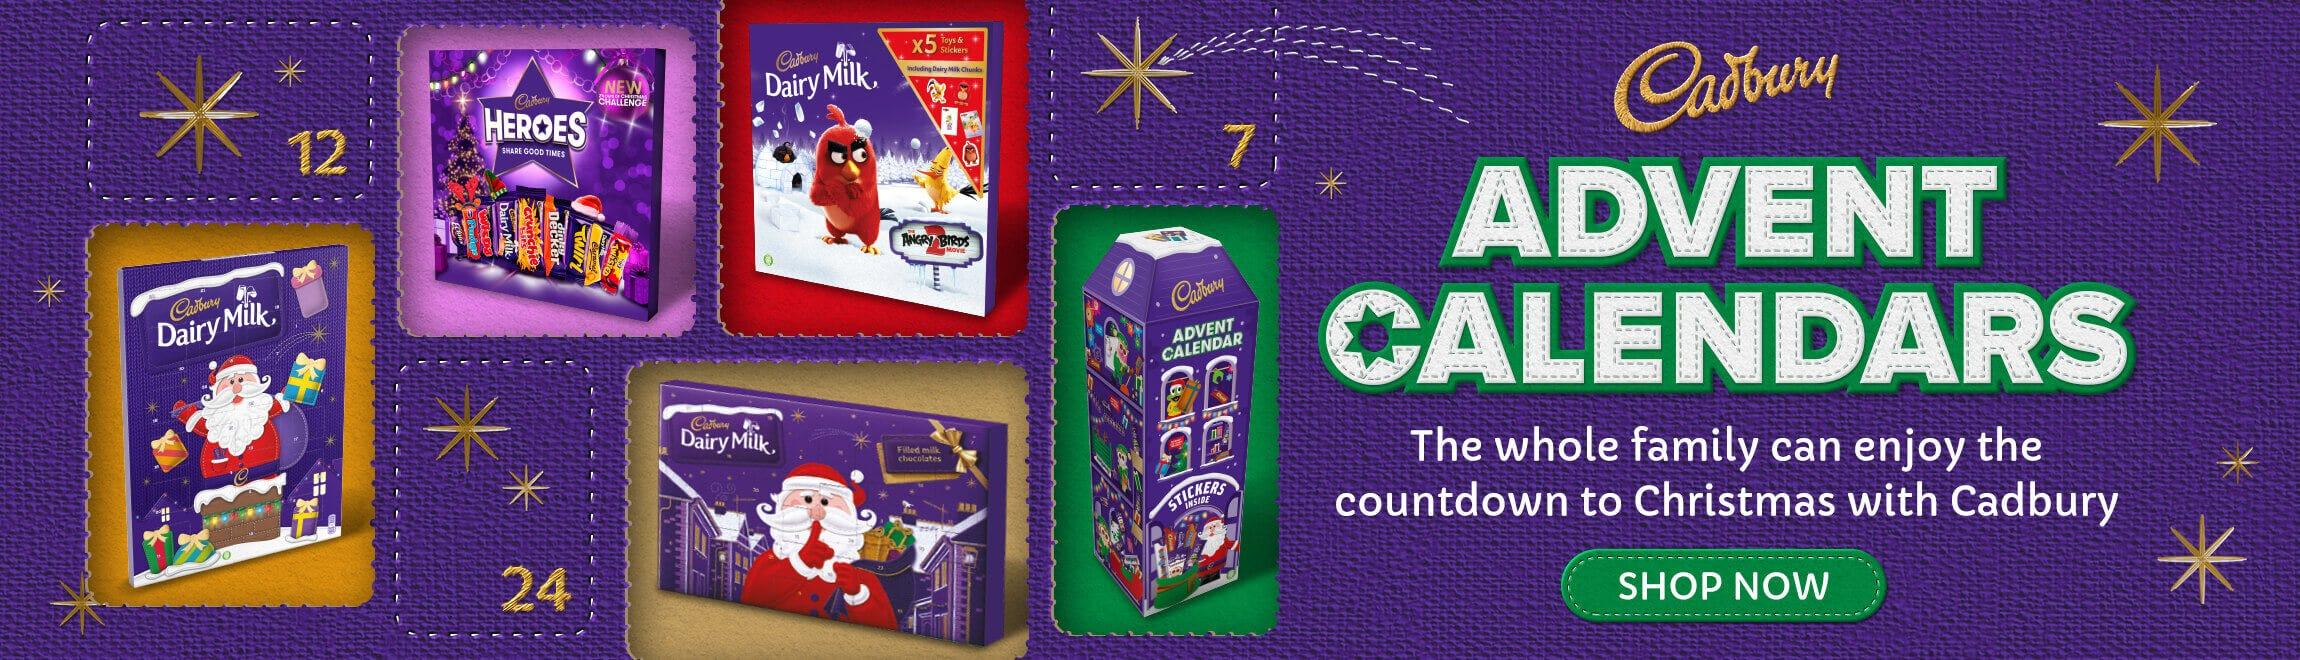 Cadbury Chocolate Advent Calendars